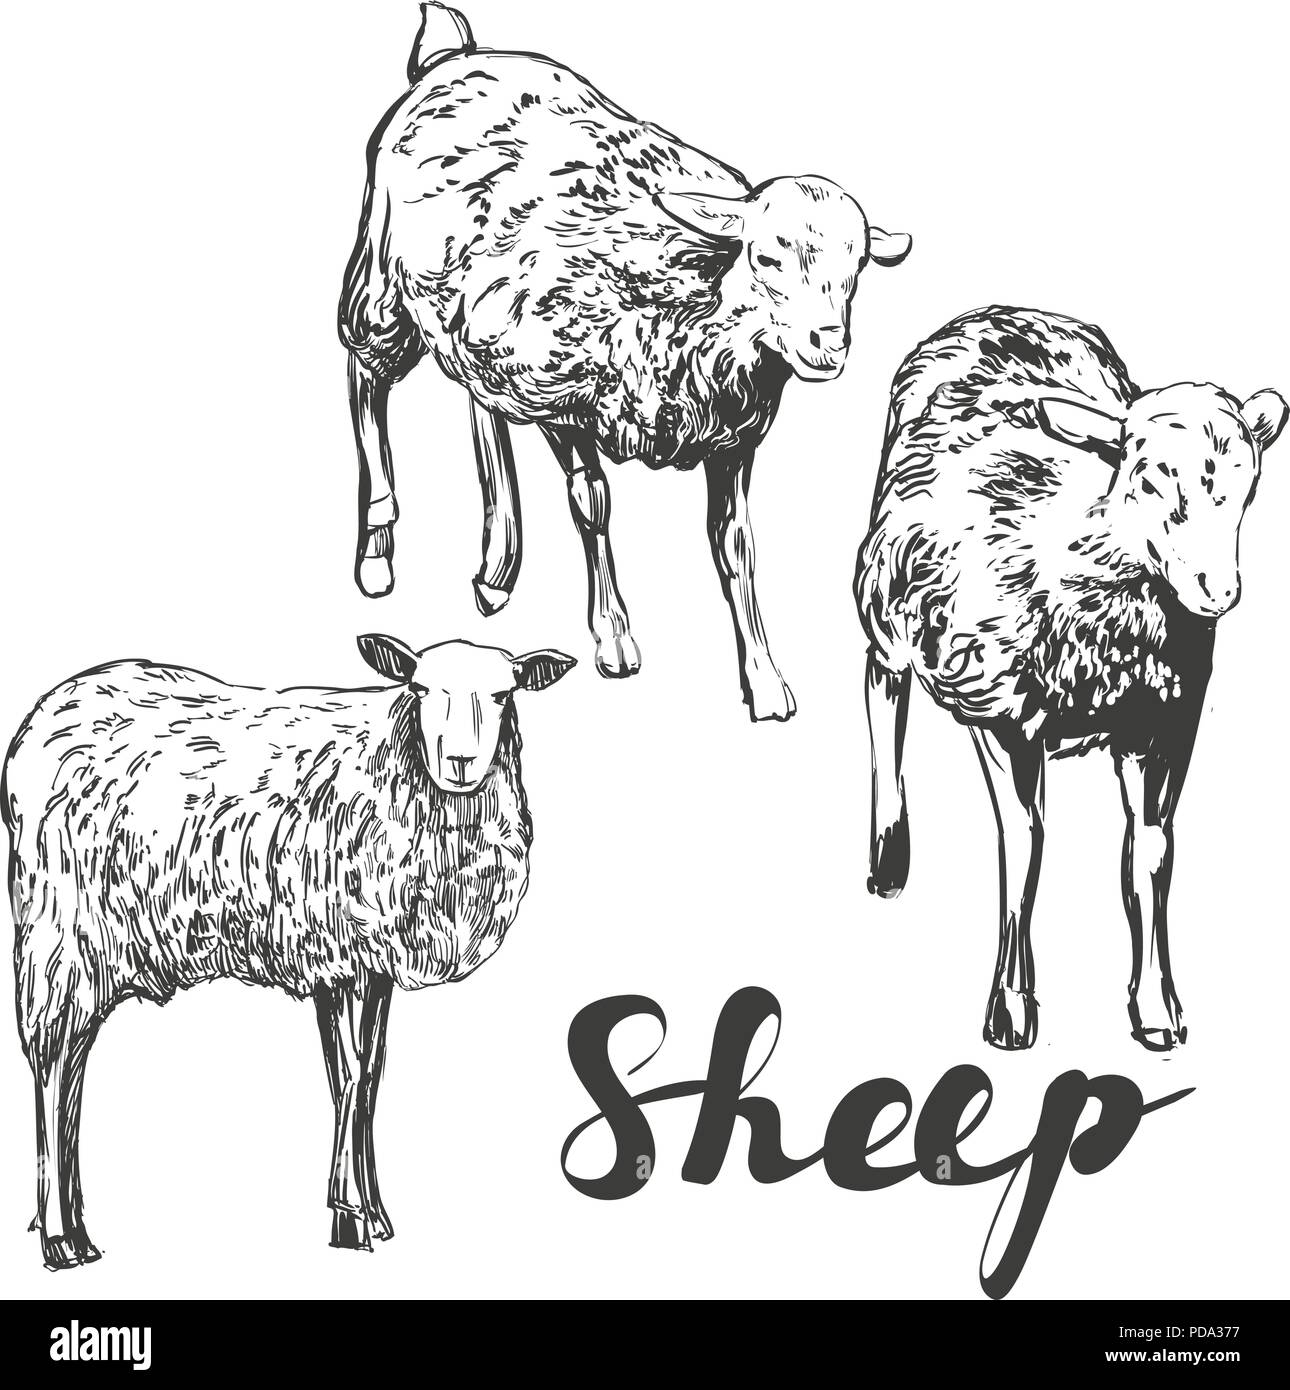 Hand Drawn Sheep Stock Photos & Hand Drawn Sheep Stock Images - Alamy